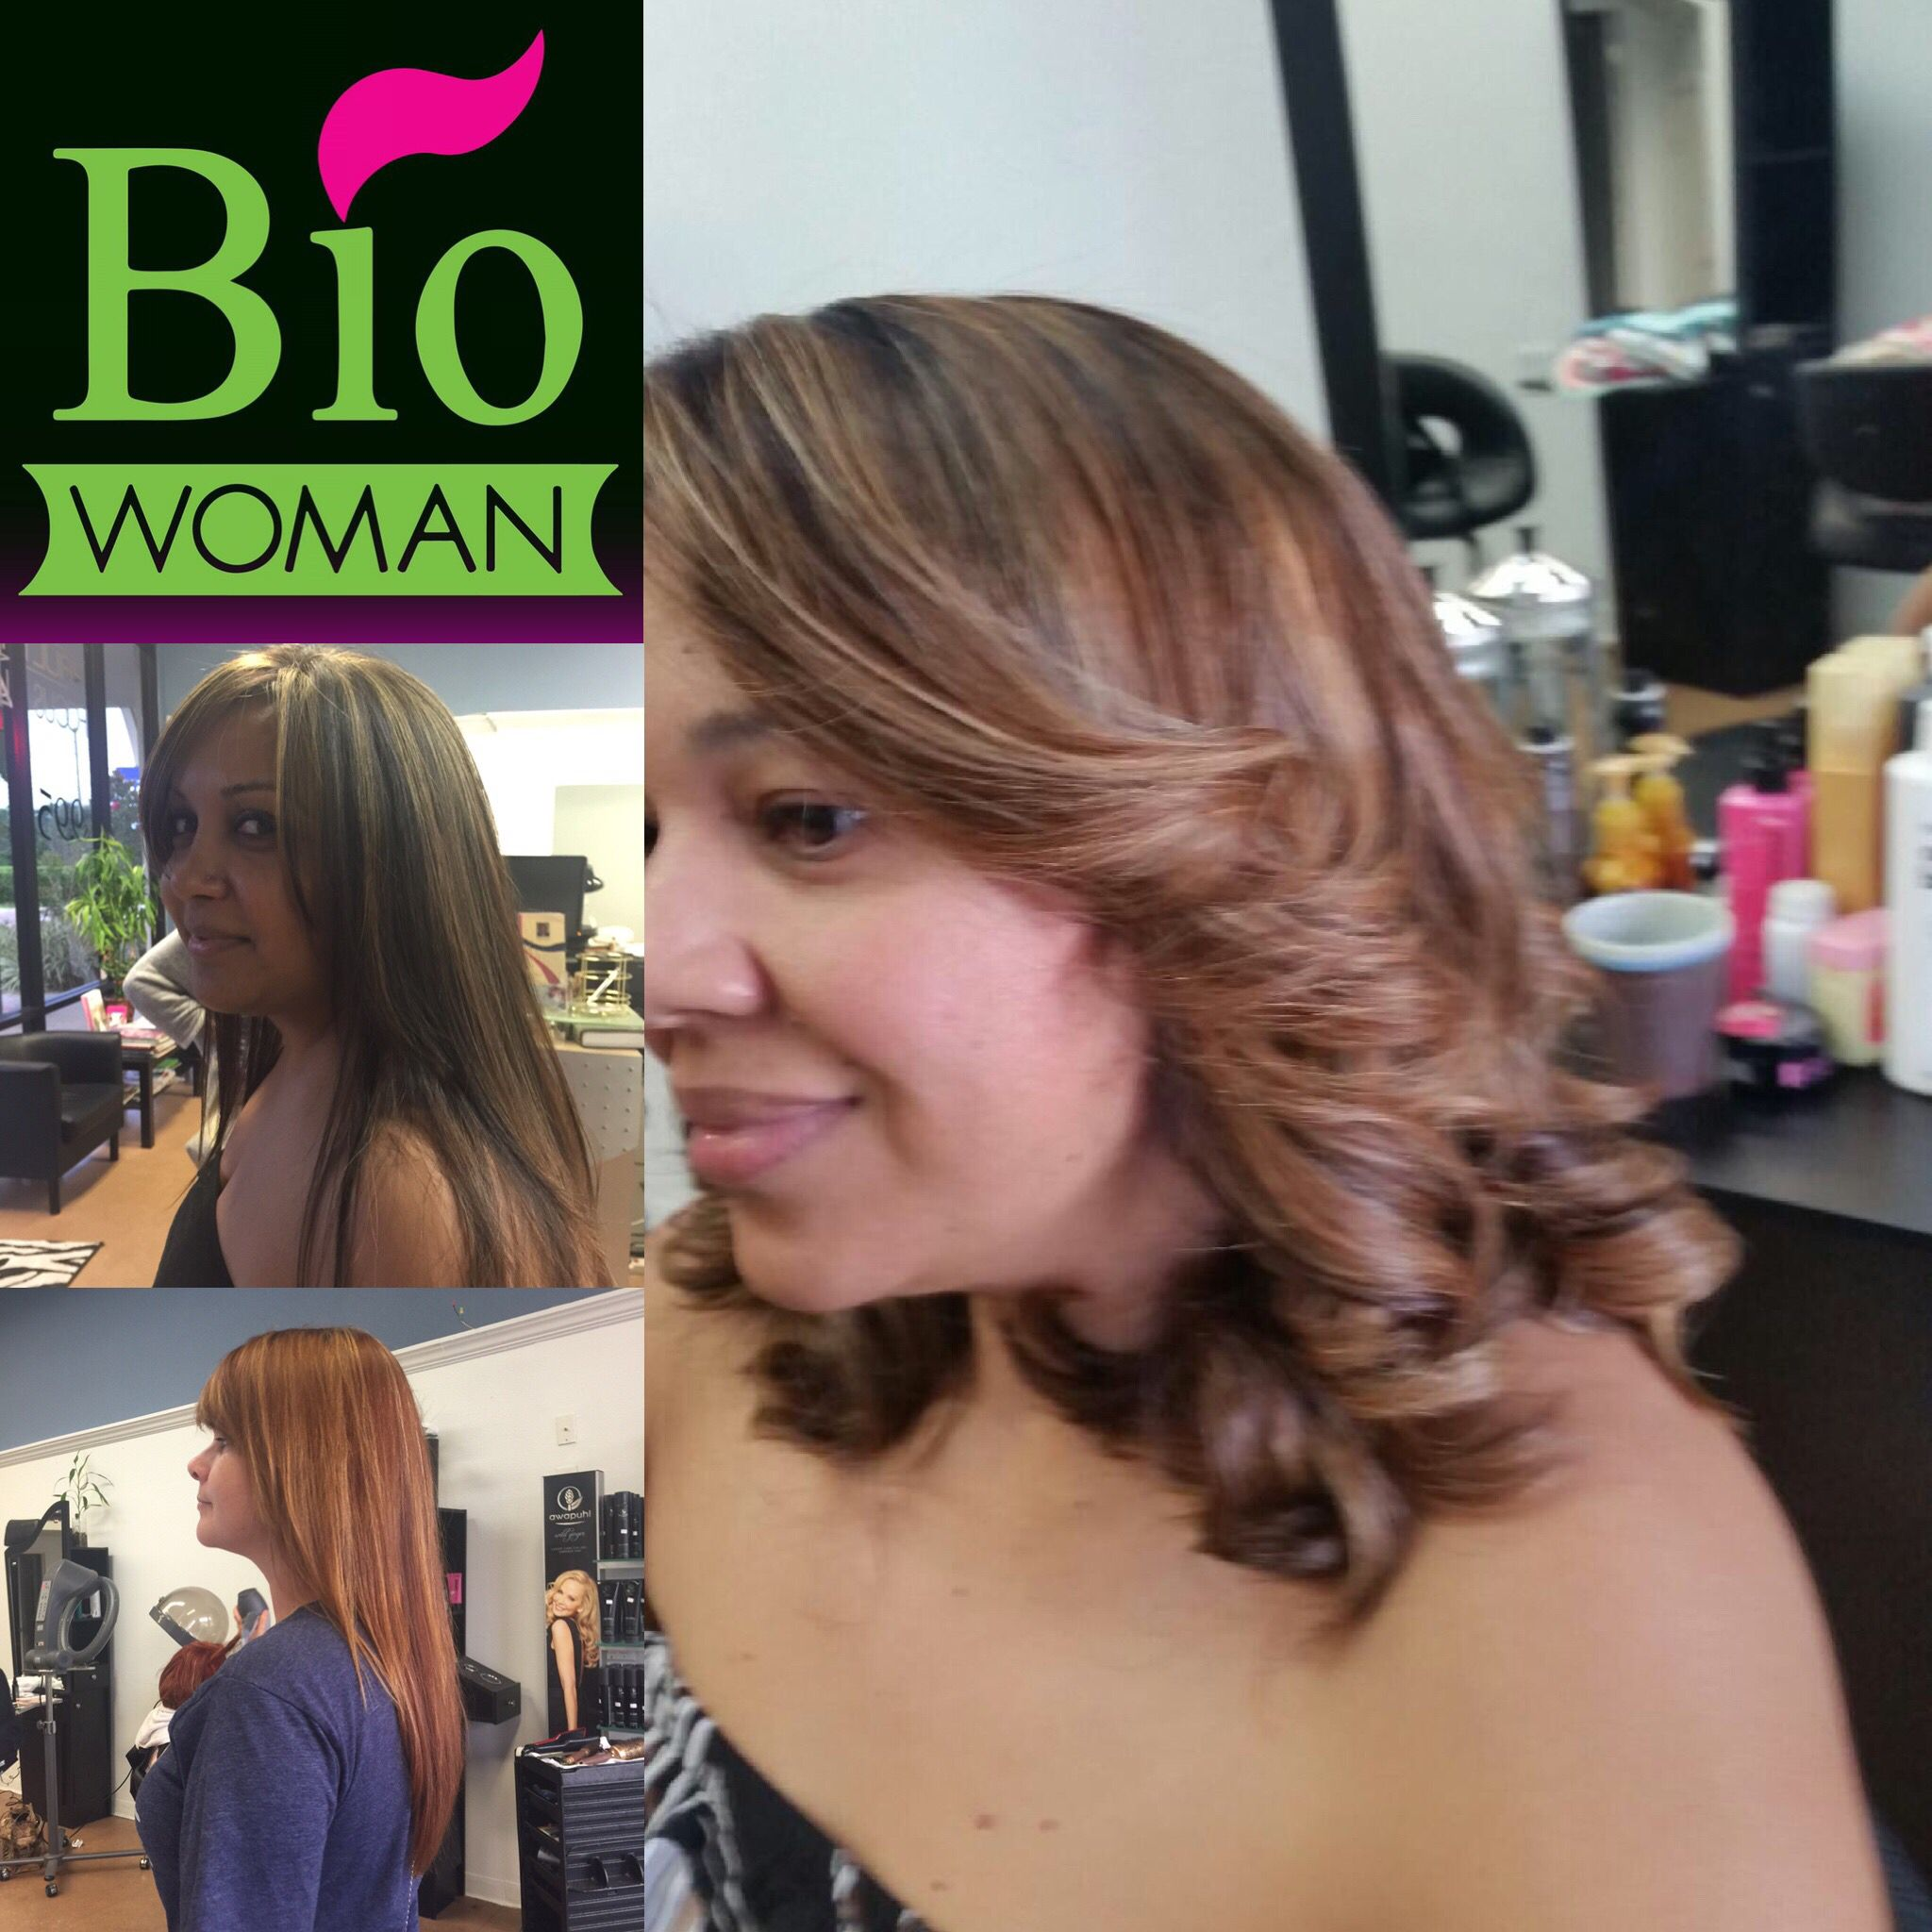 Up To 55 Off Salon Service At Biowoman Salon 29 For Shampoo